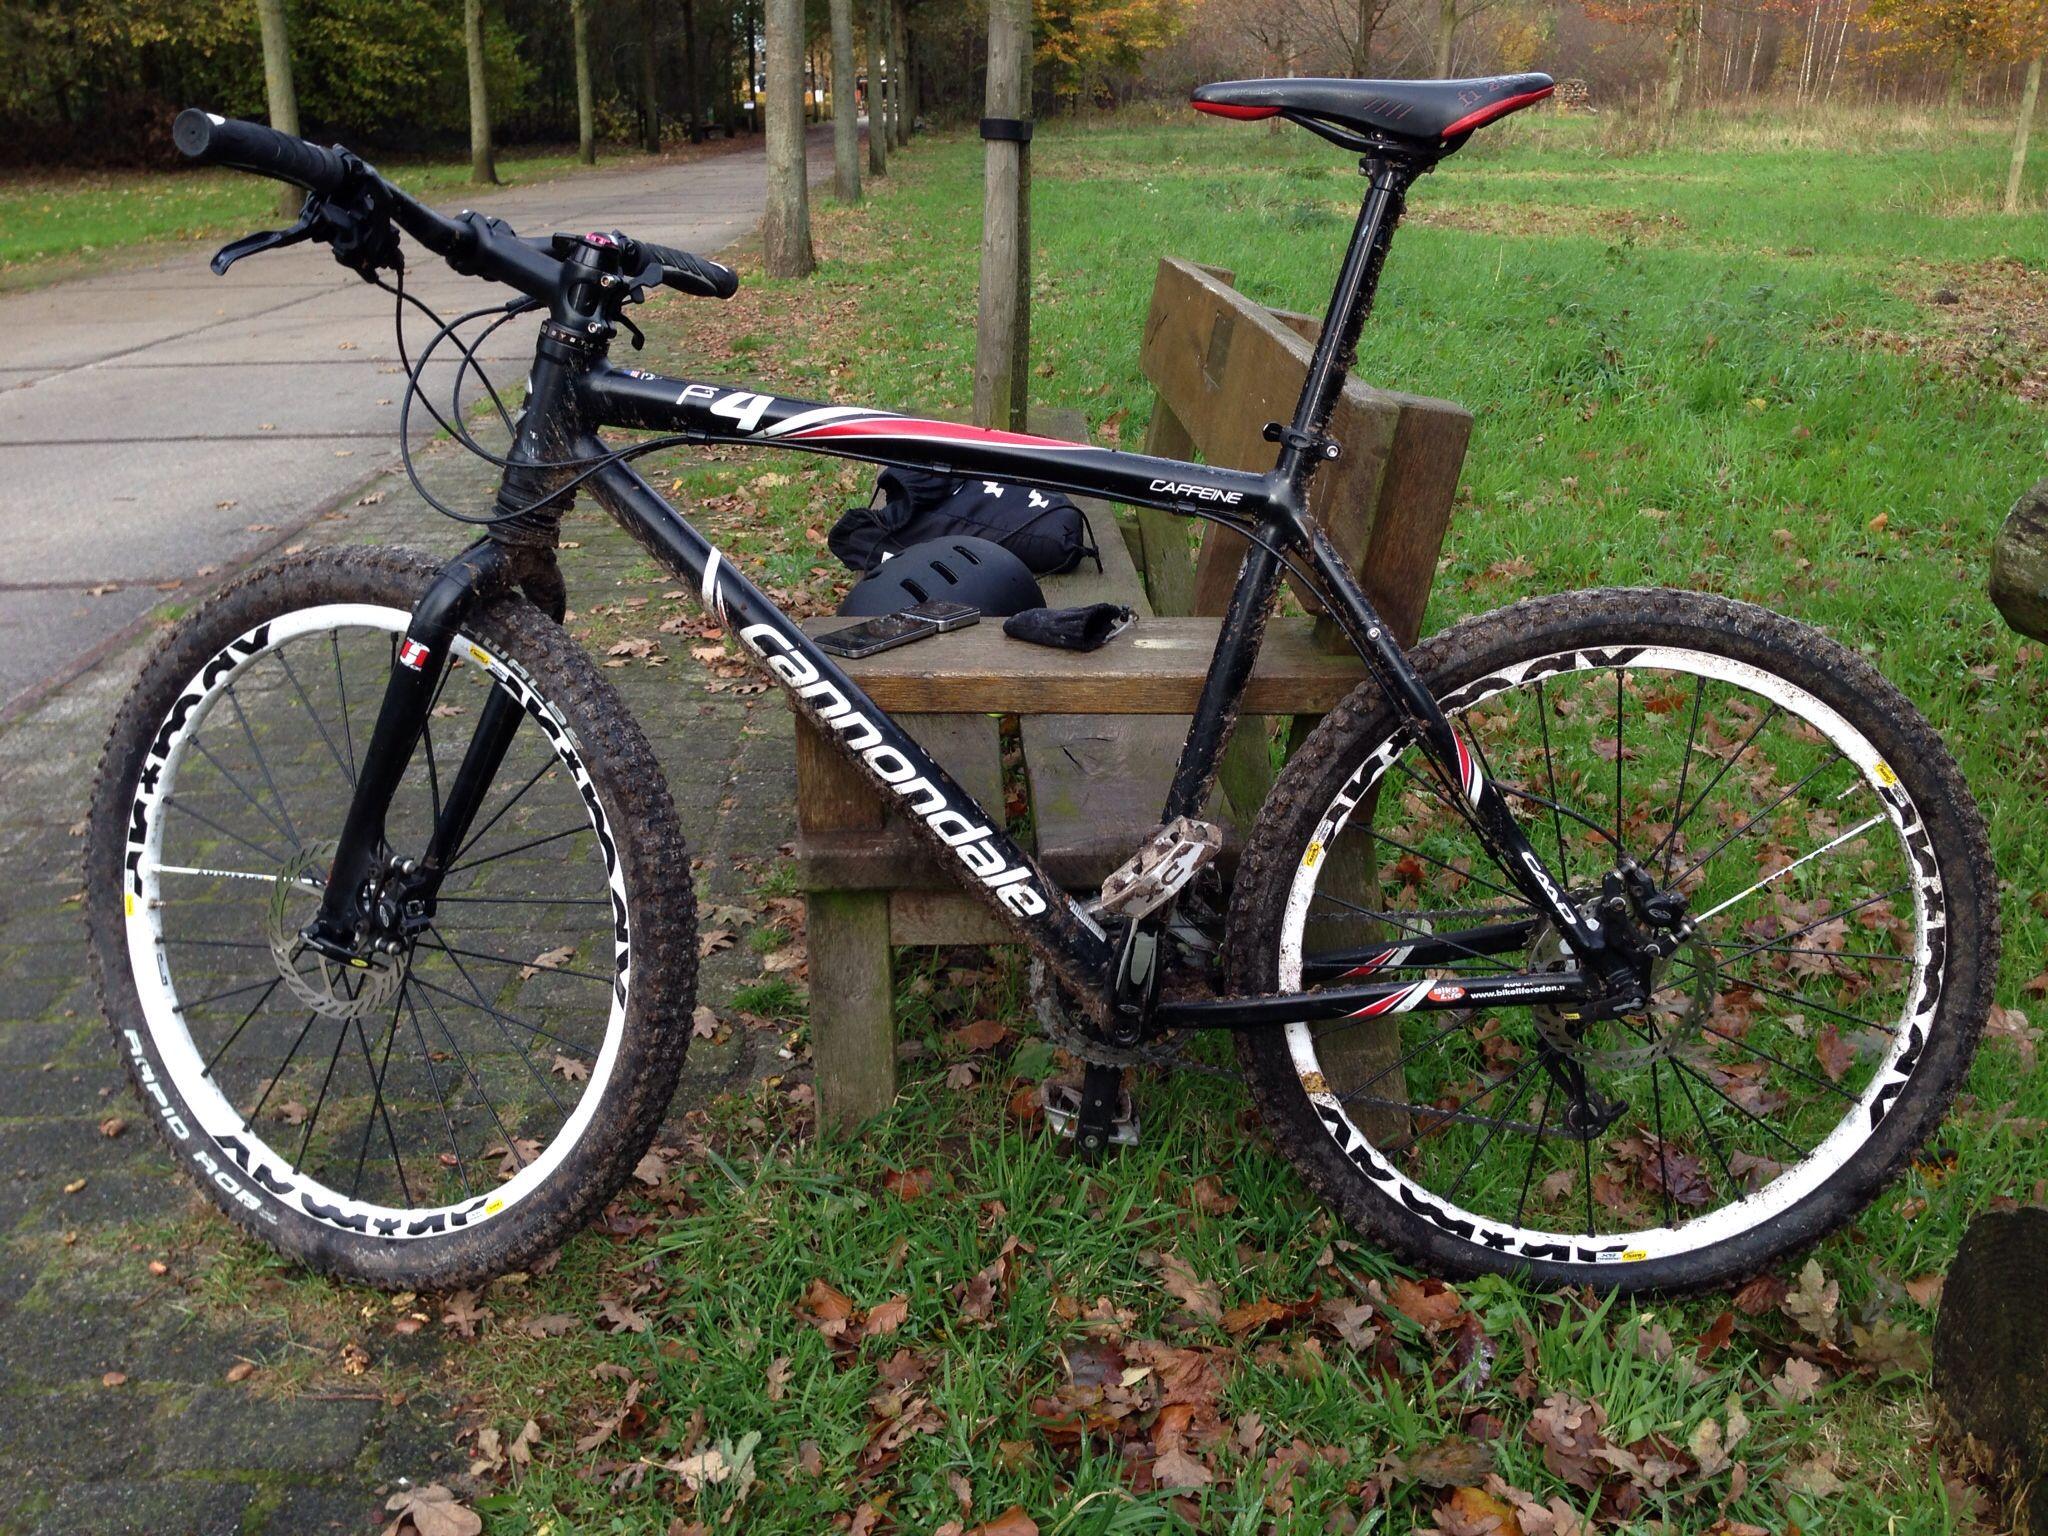 My Ride A Cannondale F4 With Mavic Crossmax Sx Wheels Bike